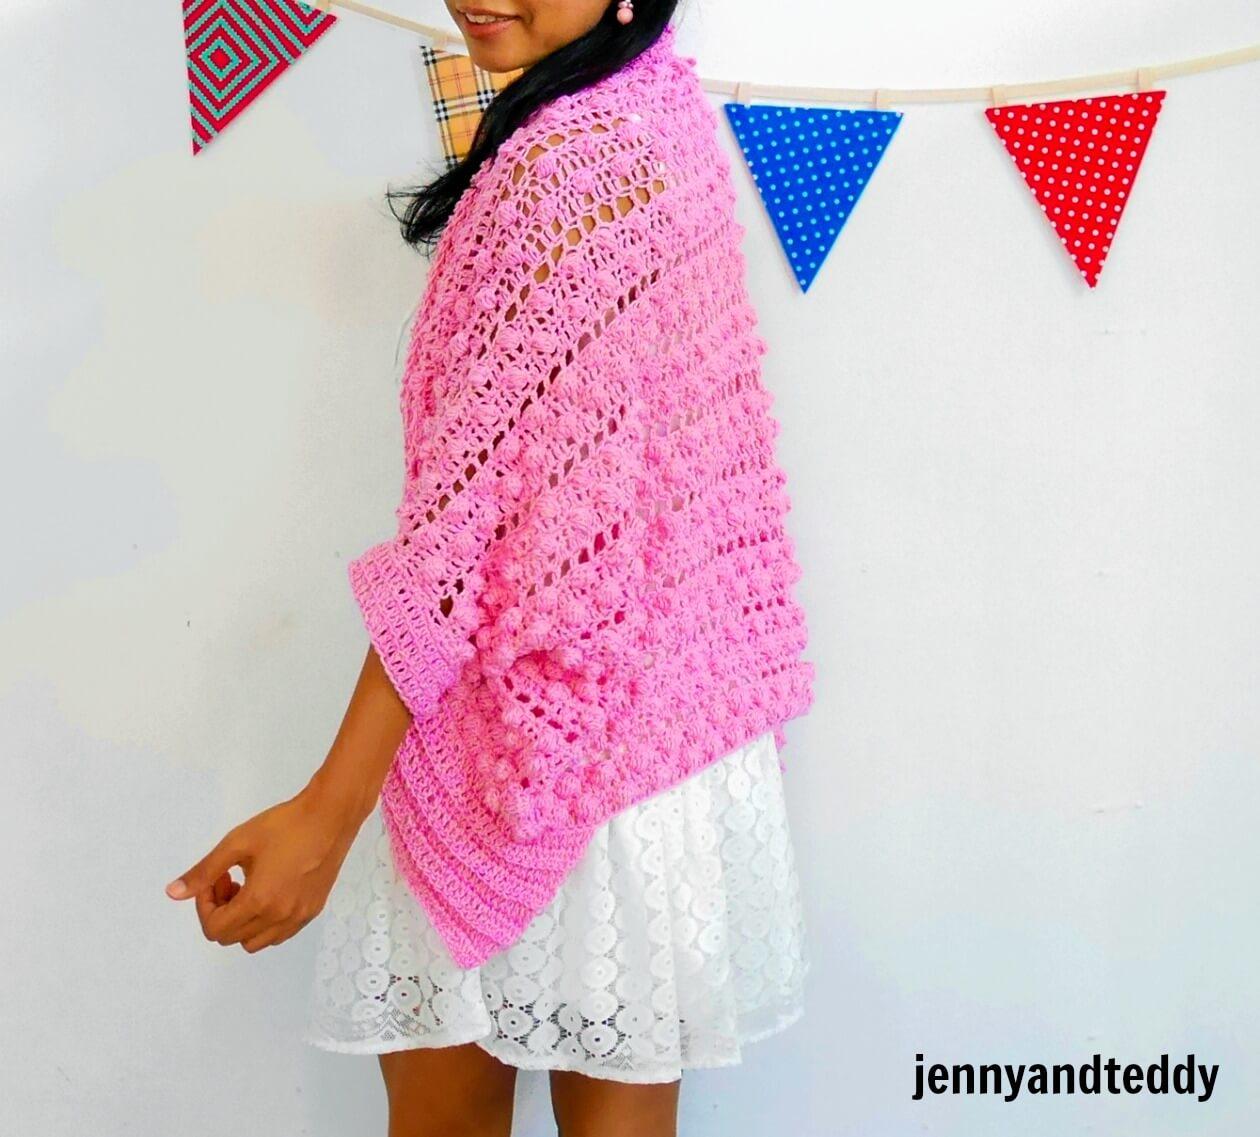 bobble crochet stitch cardigan made from cotton yarn